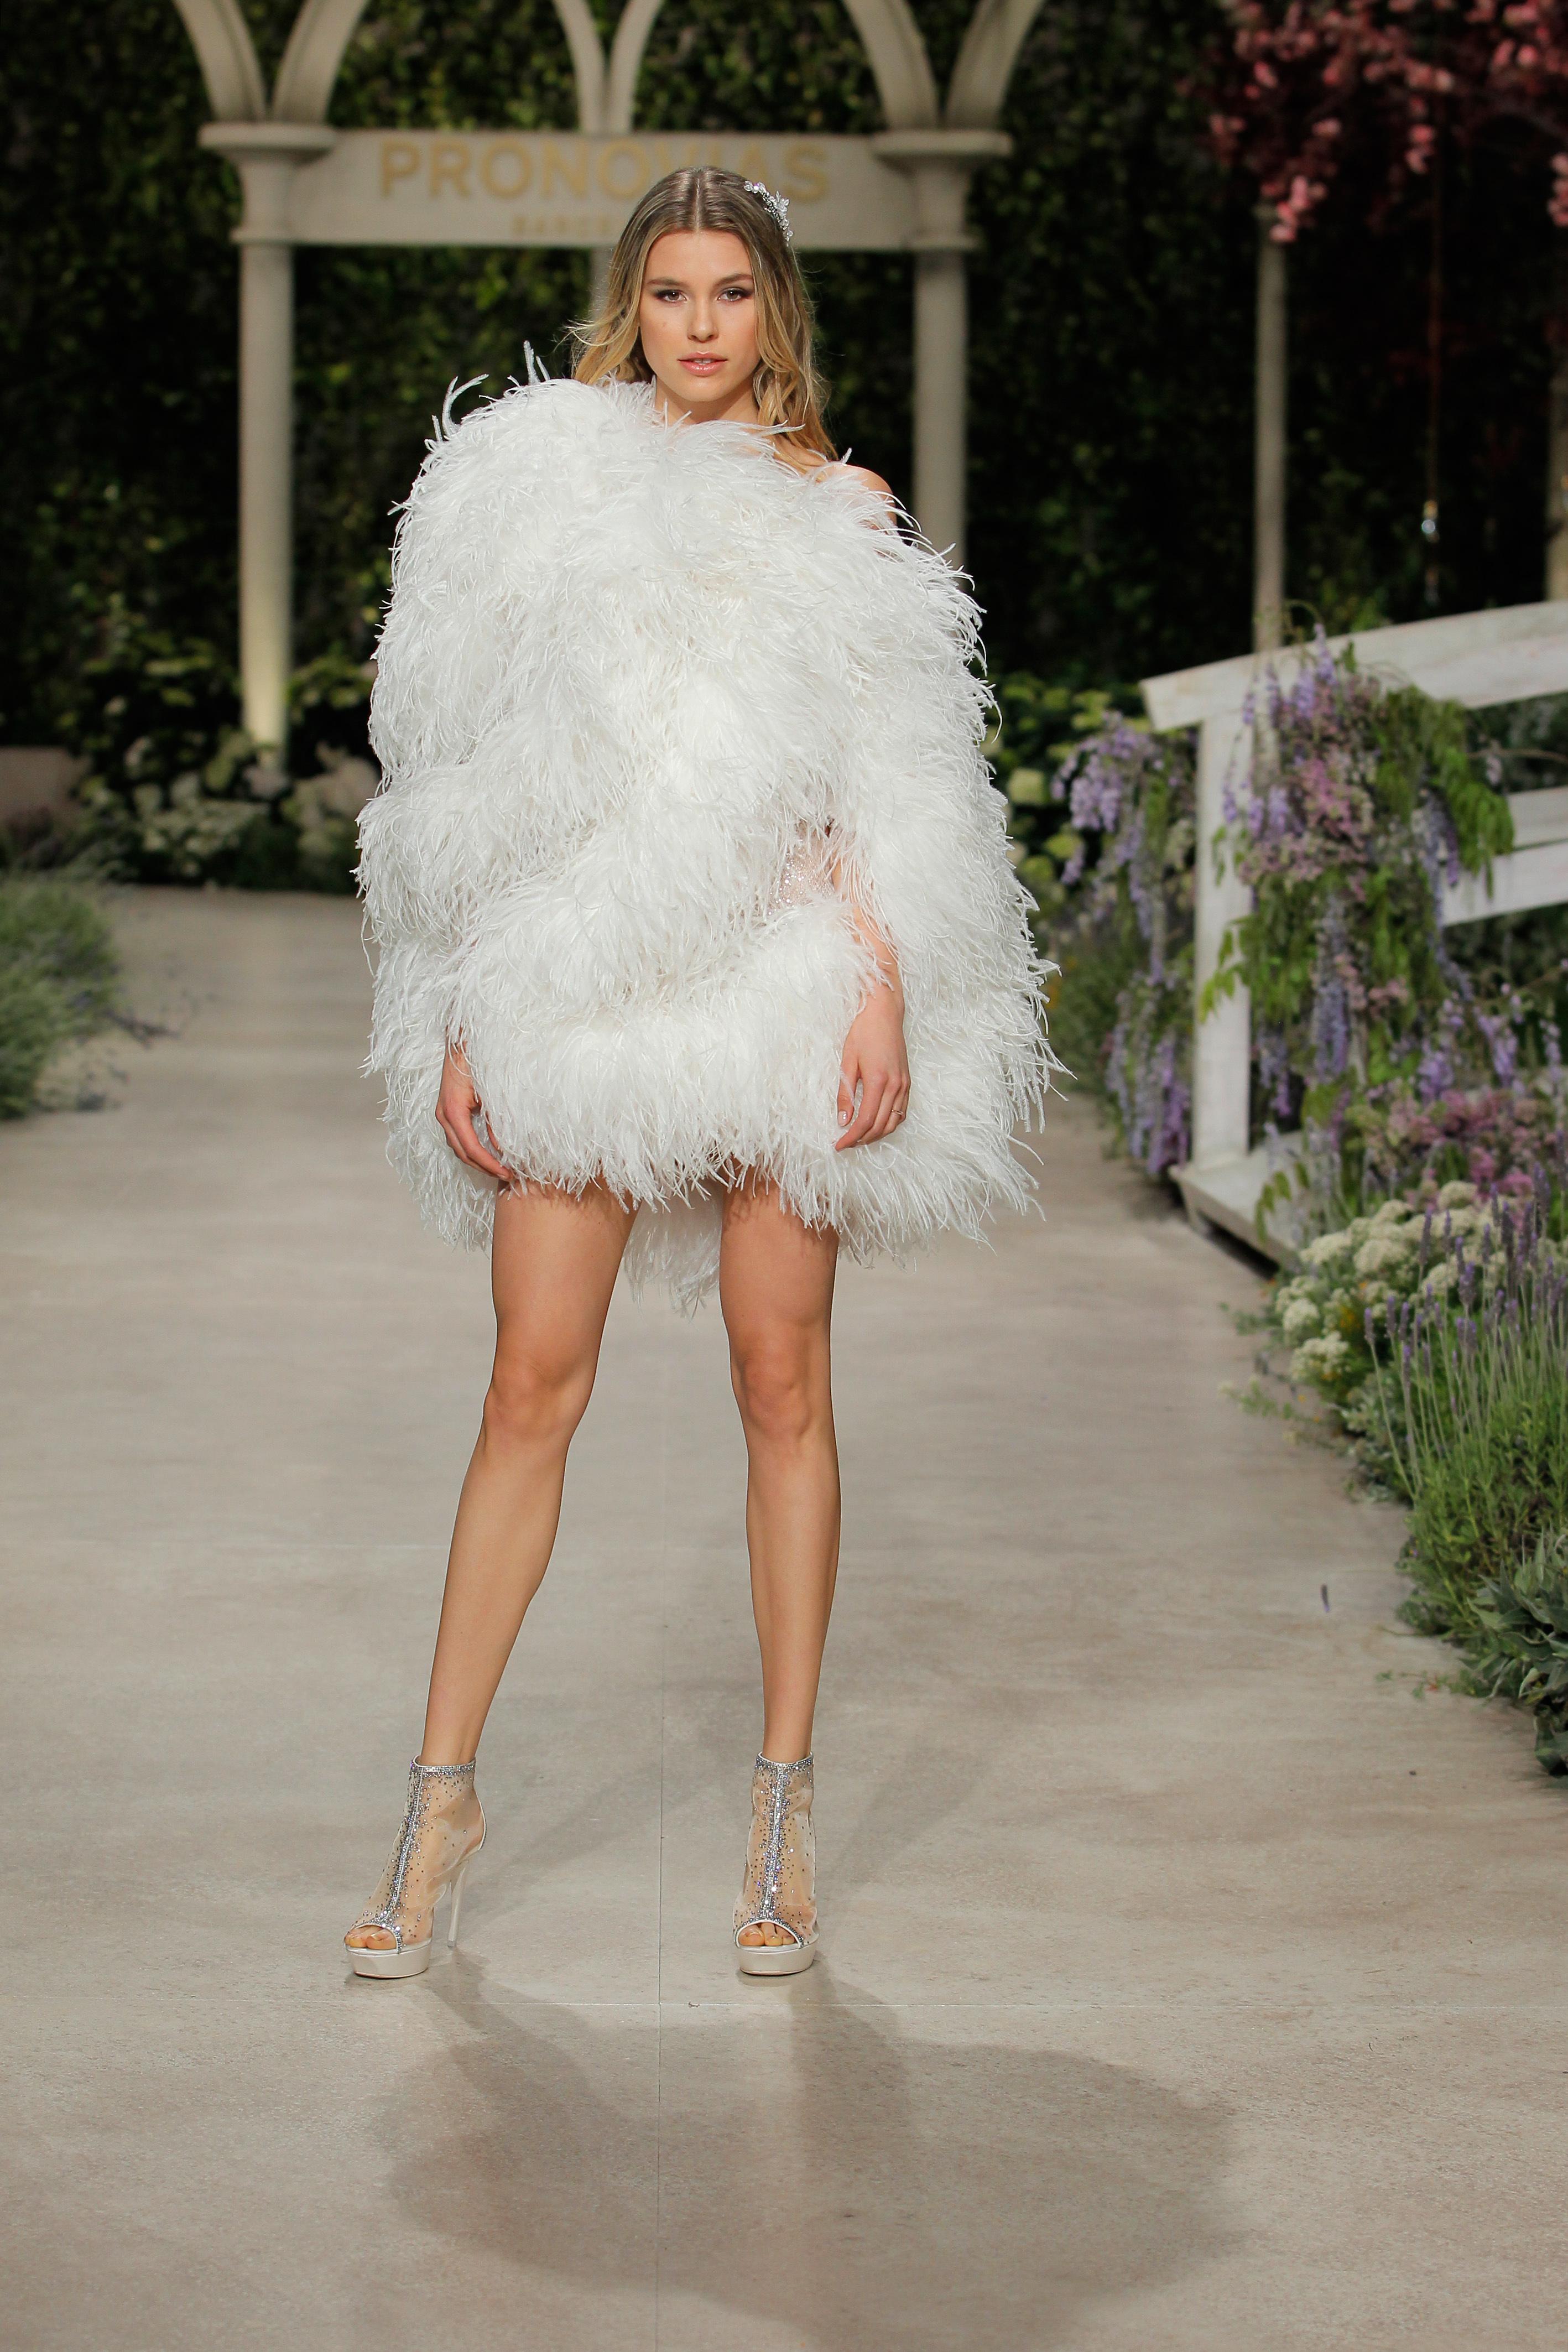 pronovias wedding dress spring 2019 short feathers